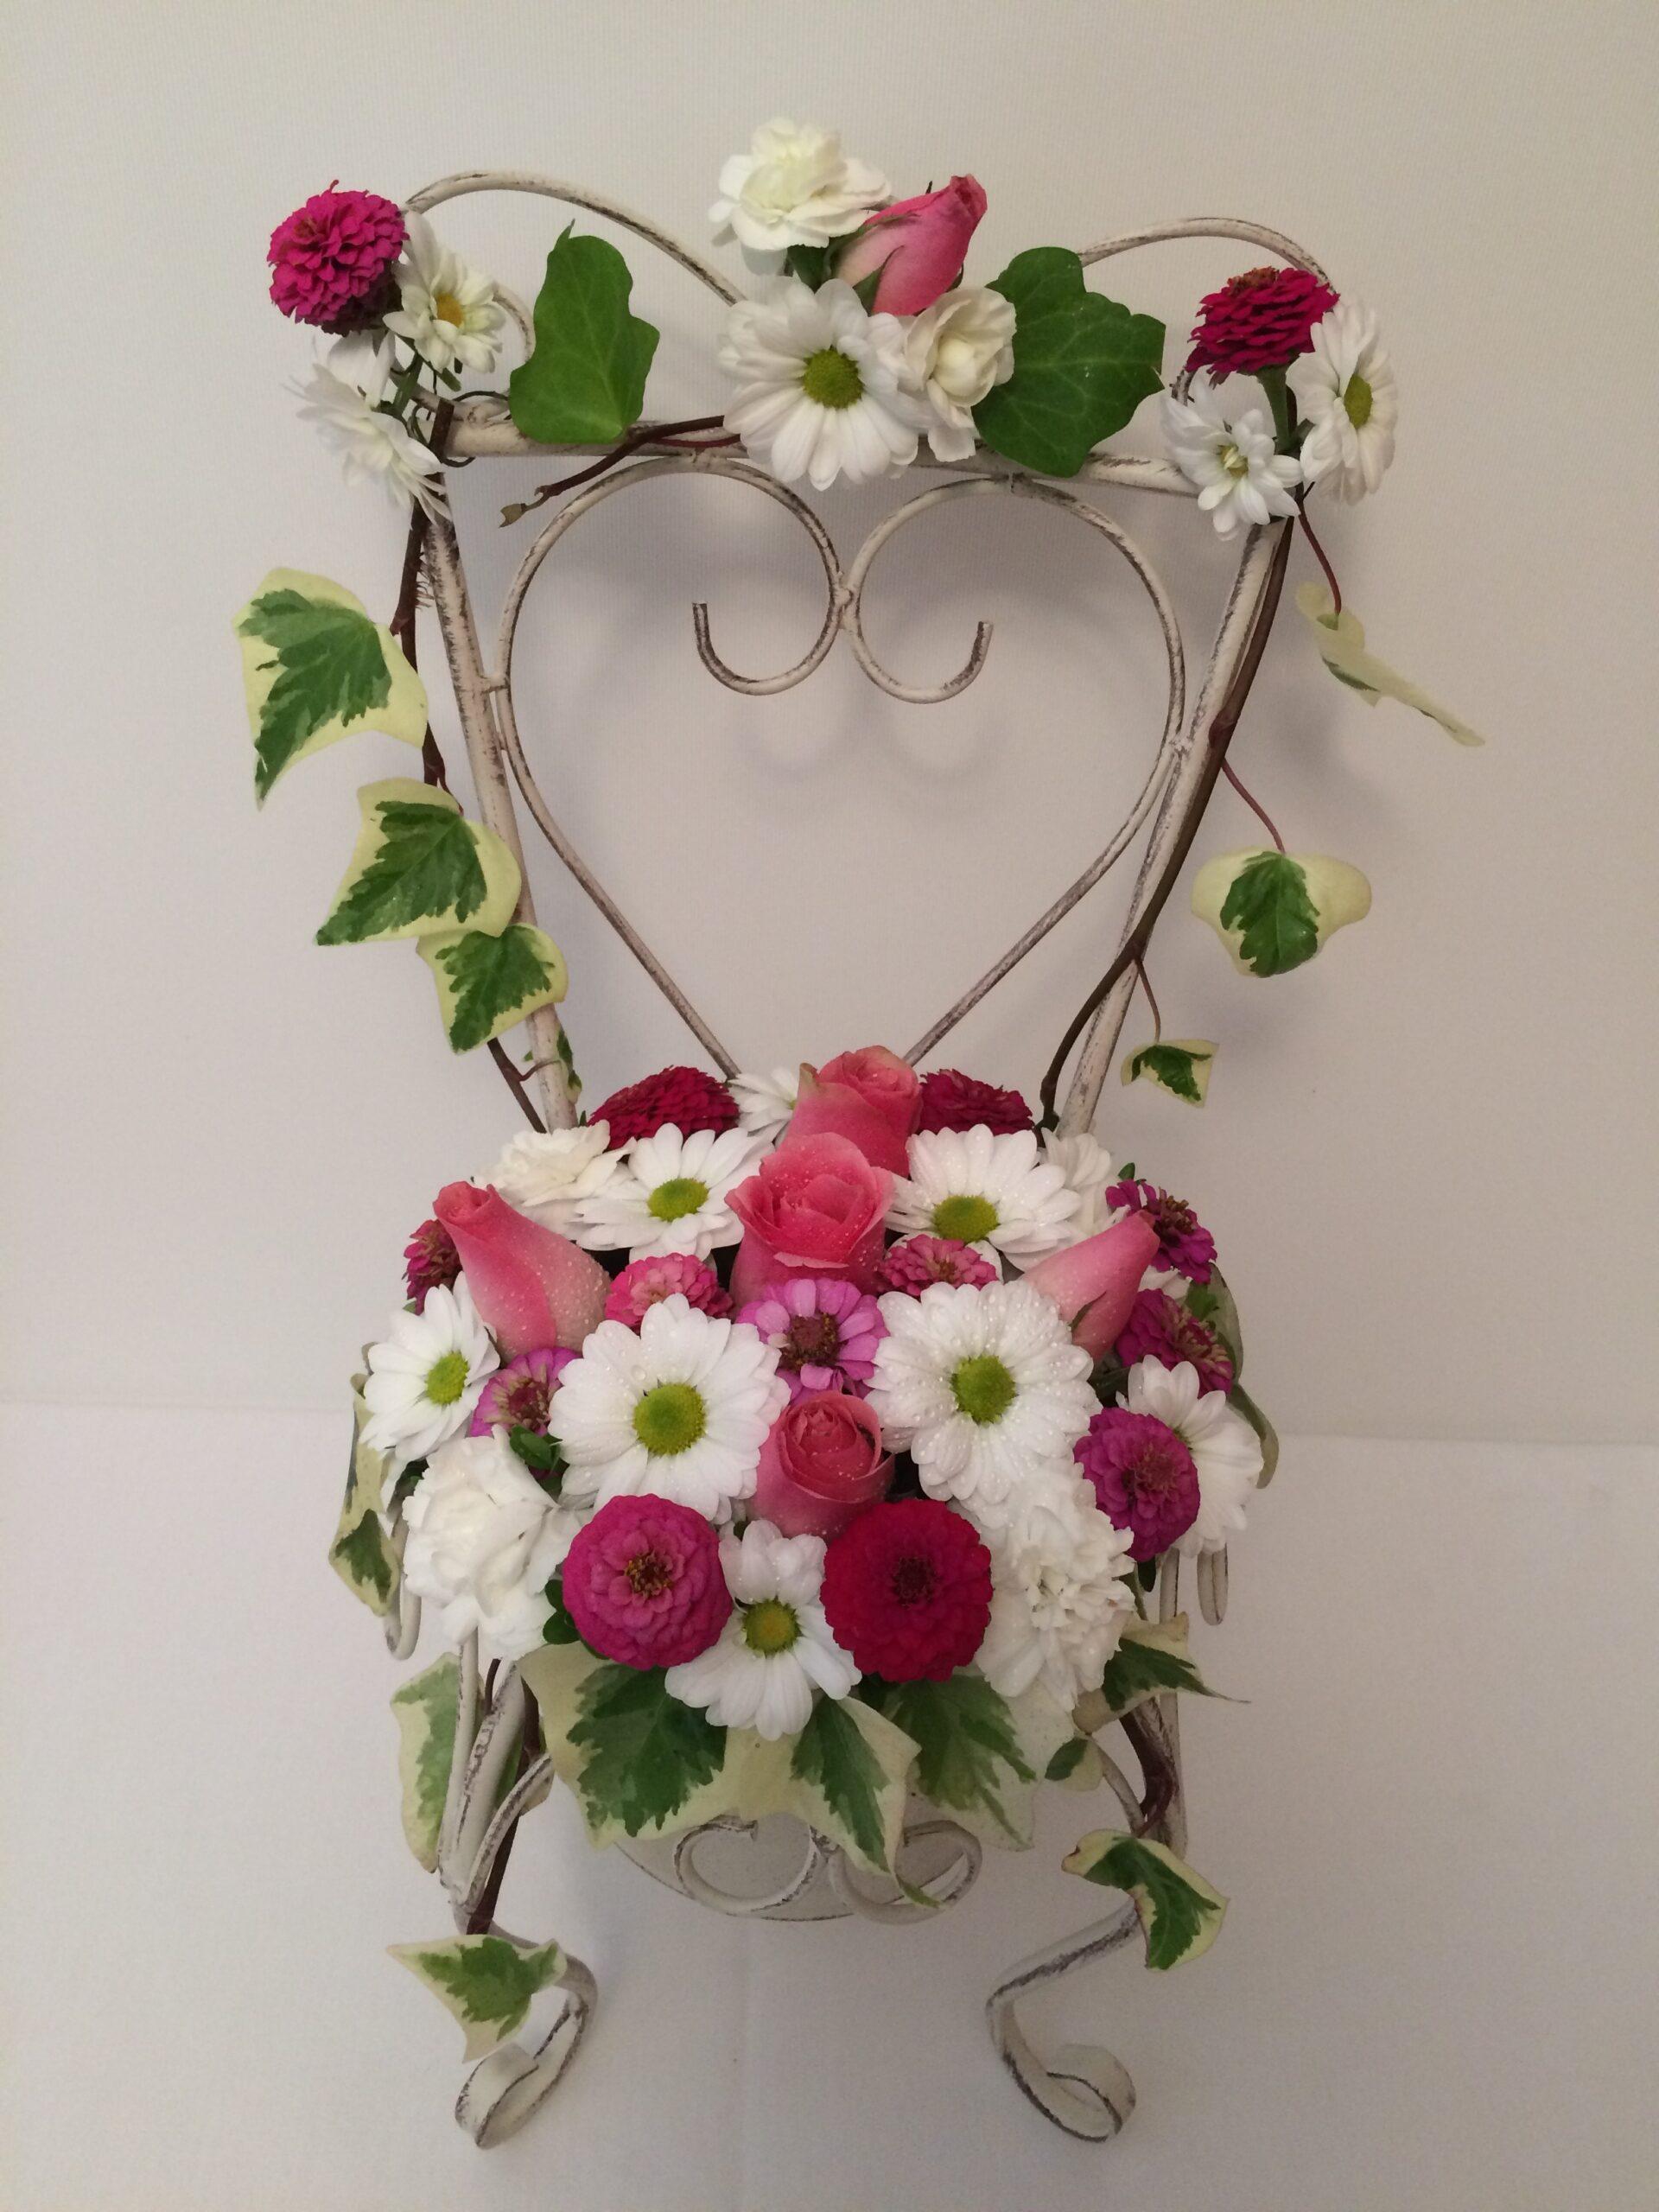 local florist shop noosaville